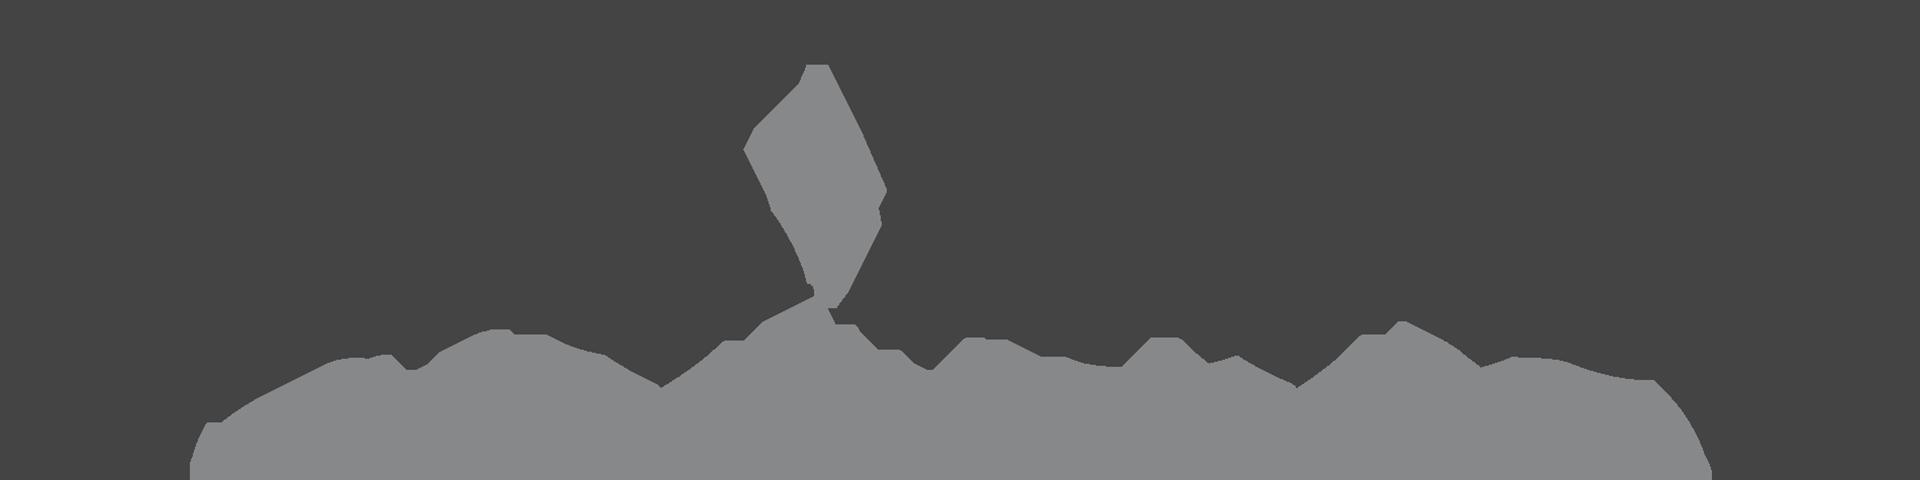 ELVSDSGN | Creative Yard | Studio Grafico